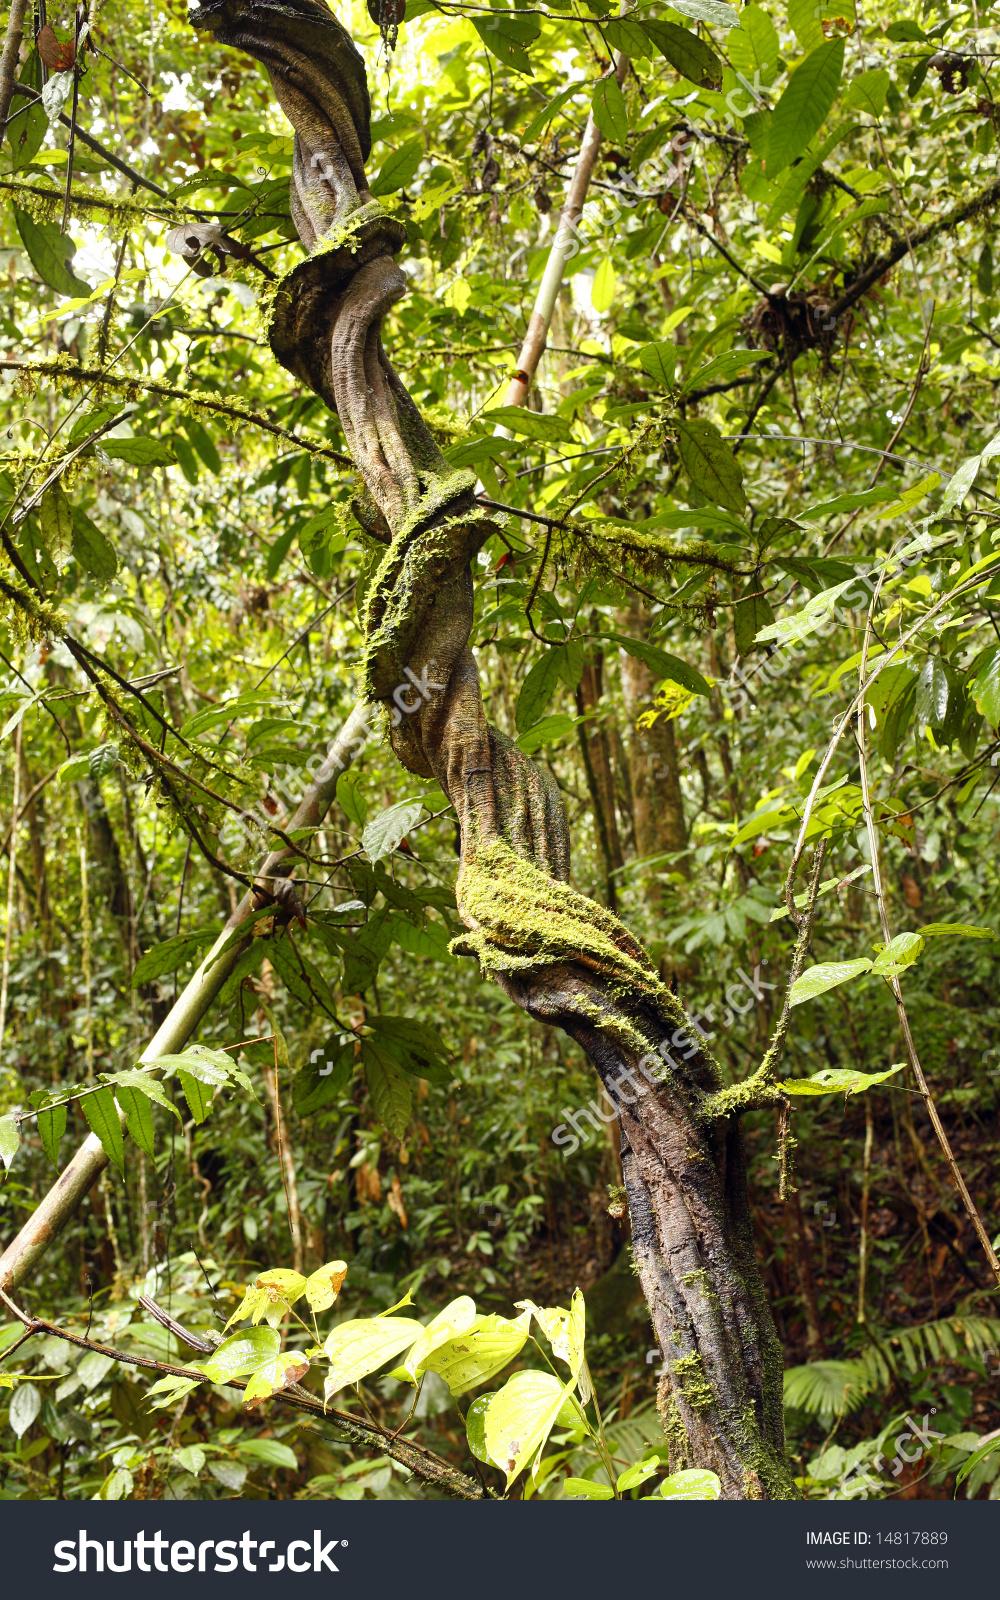 Liana In Tropical Rainforest, Ecuador Stock Photo 14817889.